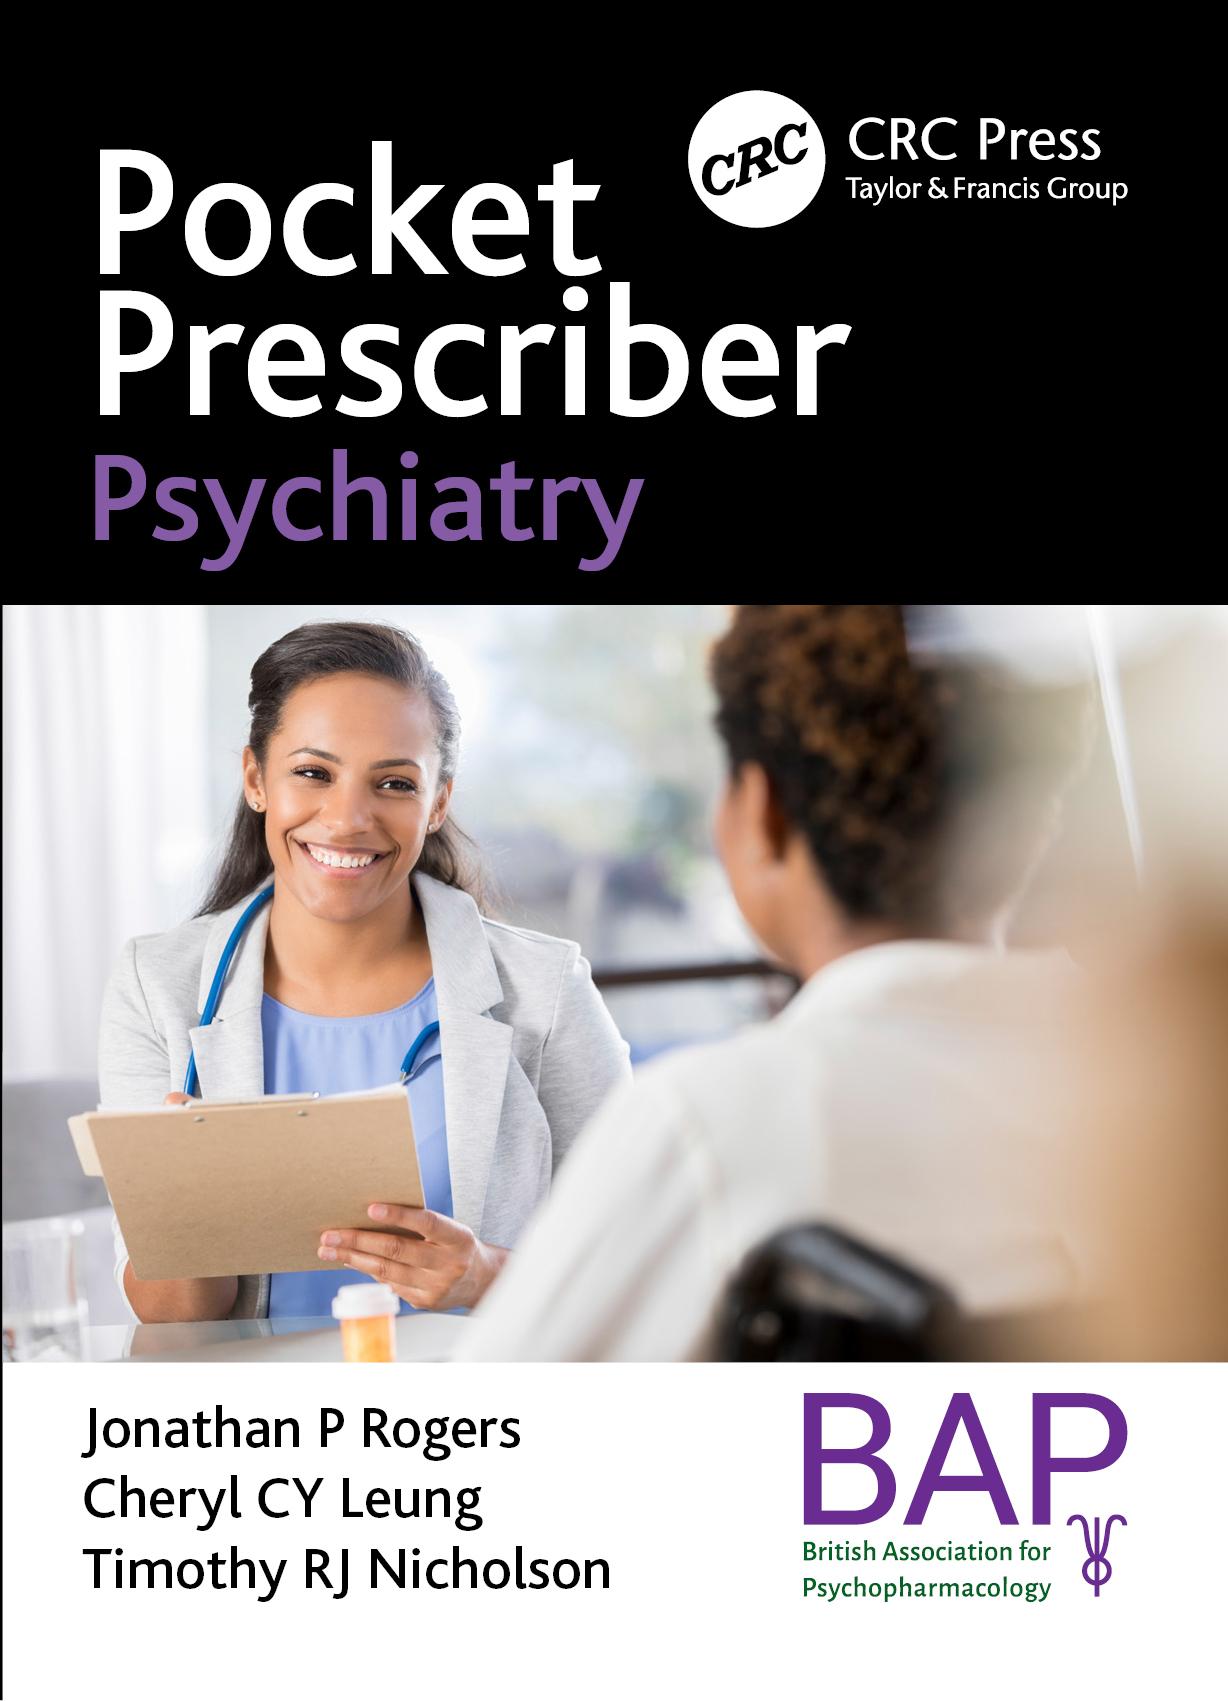 Pocket Prescriber Psychiatry